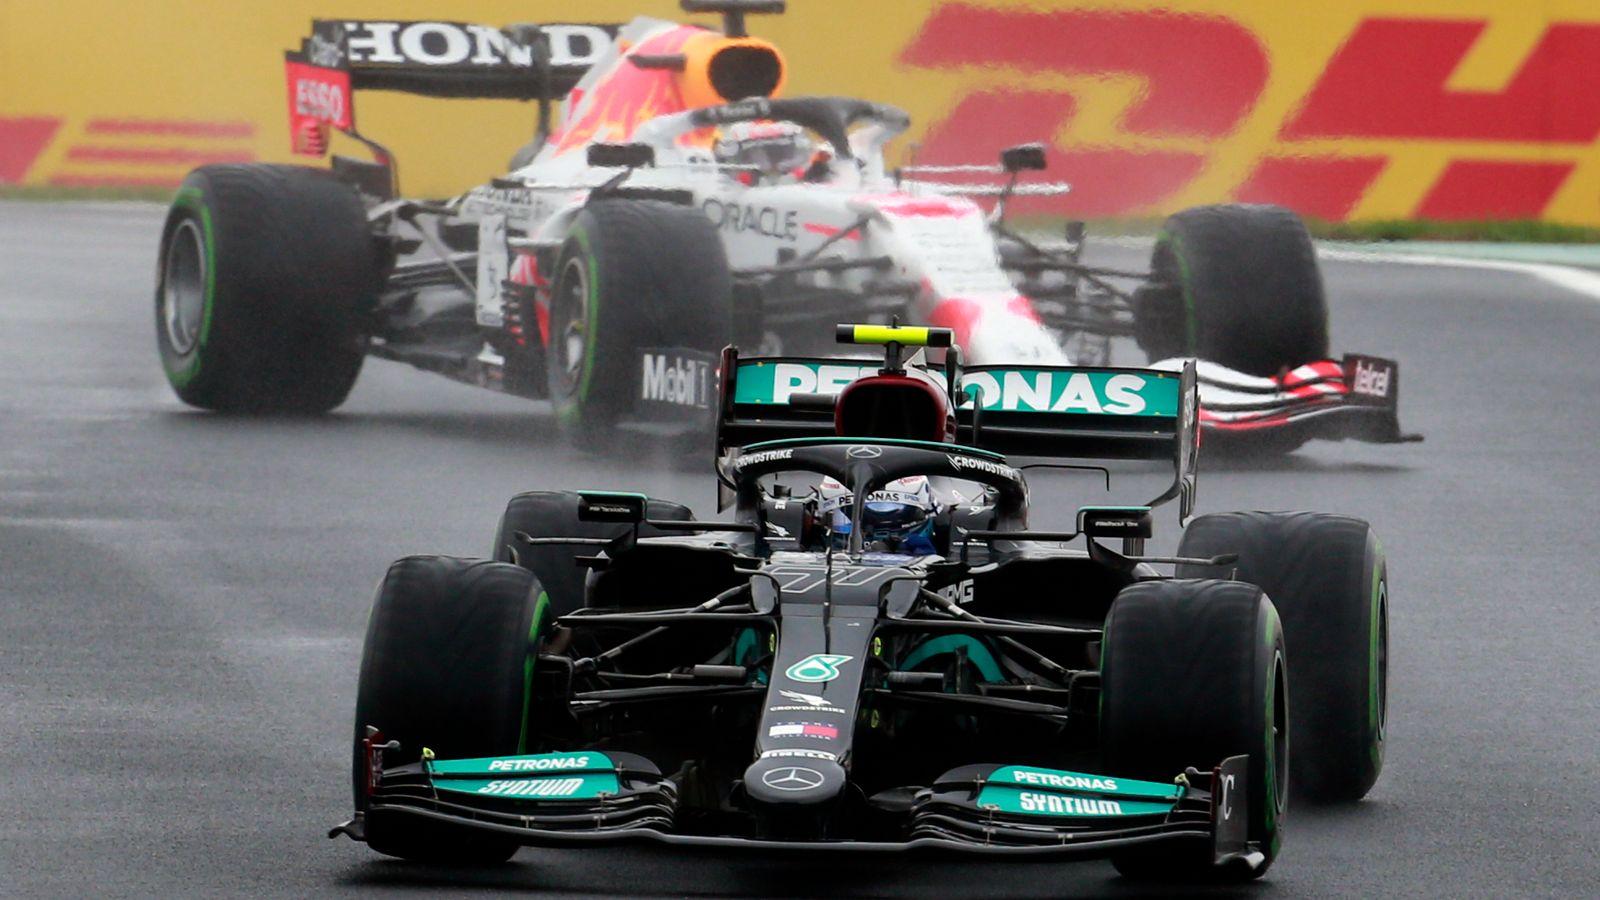 Valtteri Bottas về nhất chặng Thổ nhĩ kỳ Grand Prix